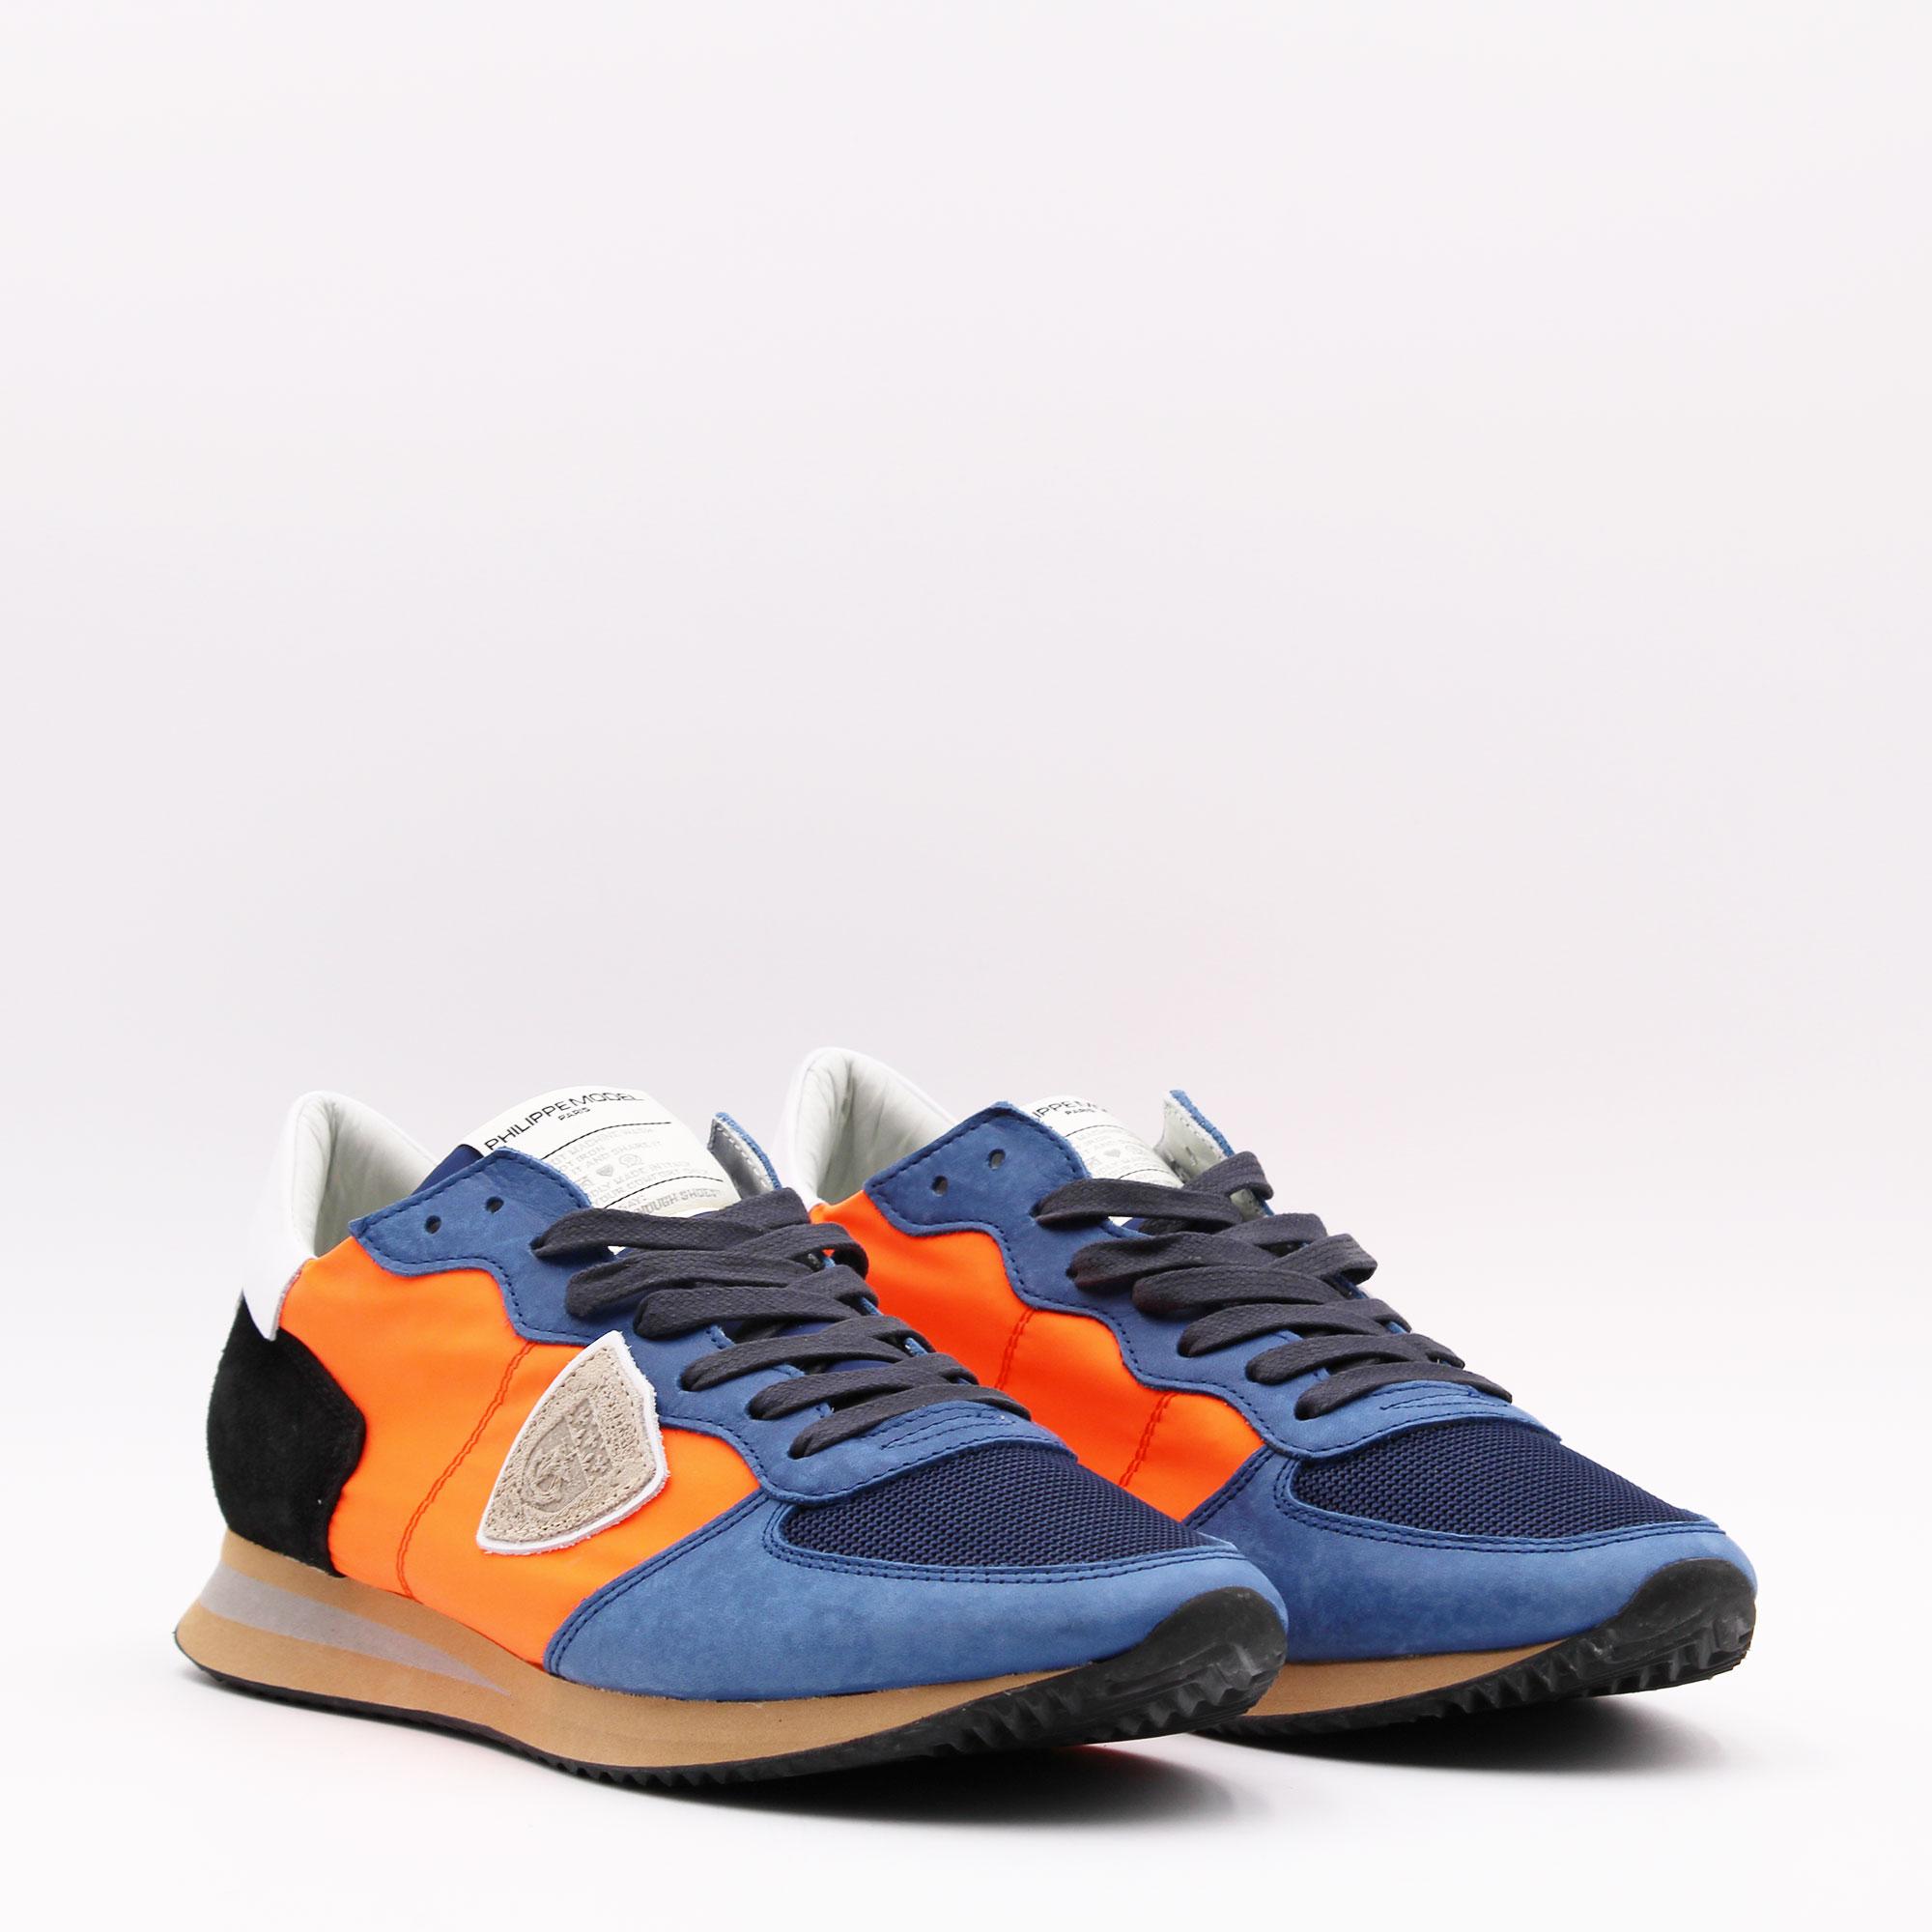 Trpx vintage mondial - Arancio/ Bluette